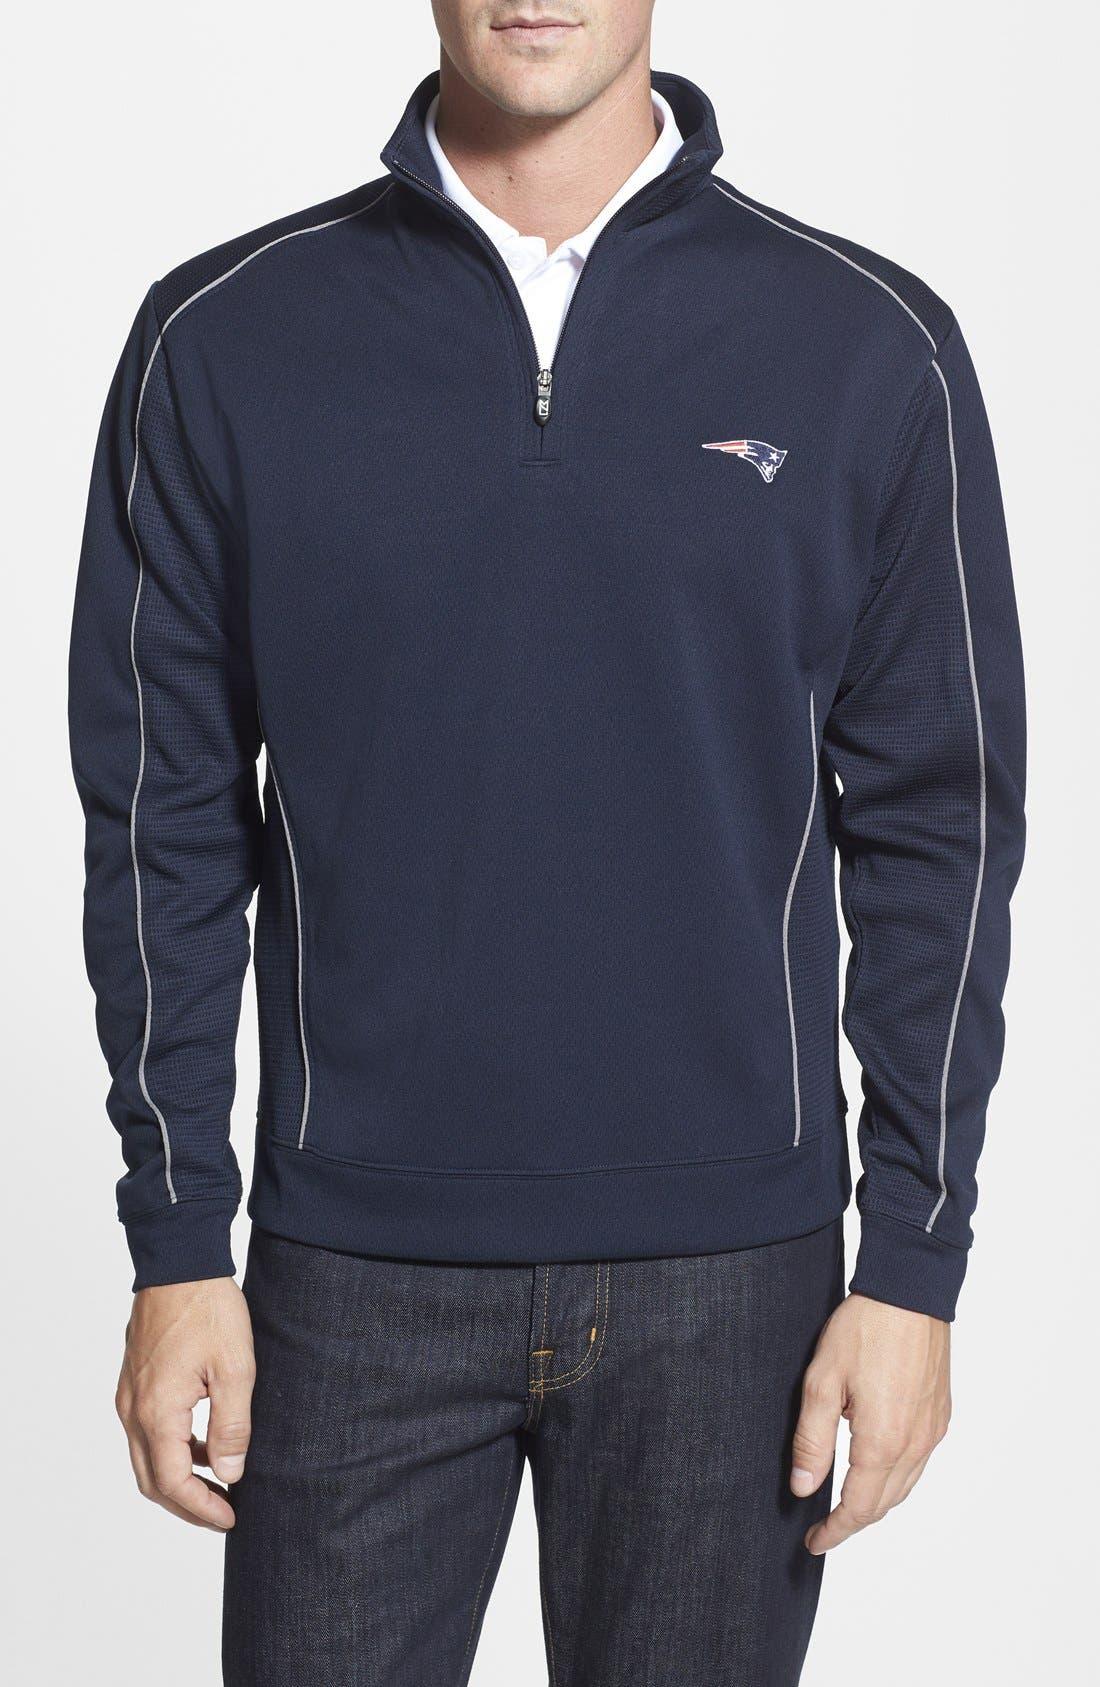 Main Image - Cutter & Buck New England Patriots - Edge DryTec Moisture Wicking Half Zip Pullover